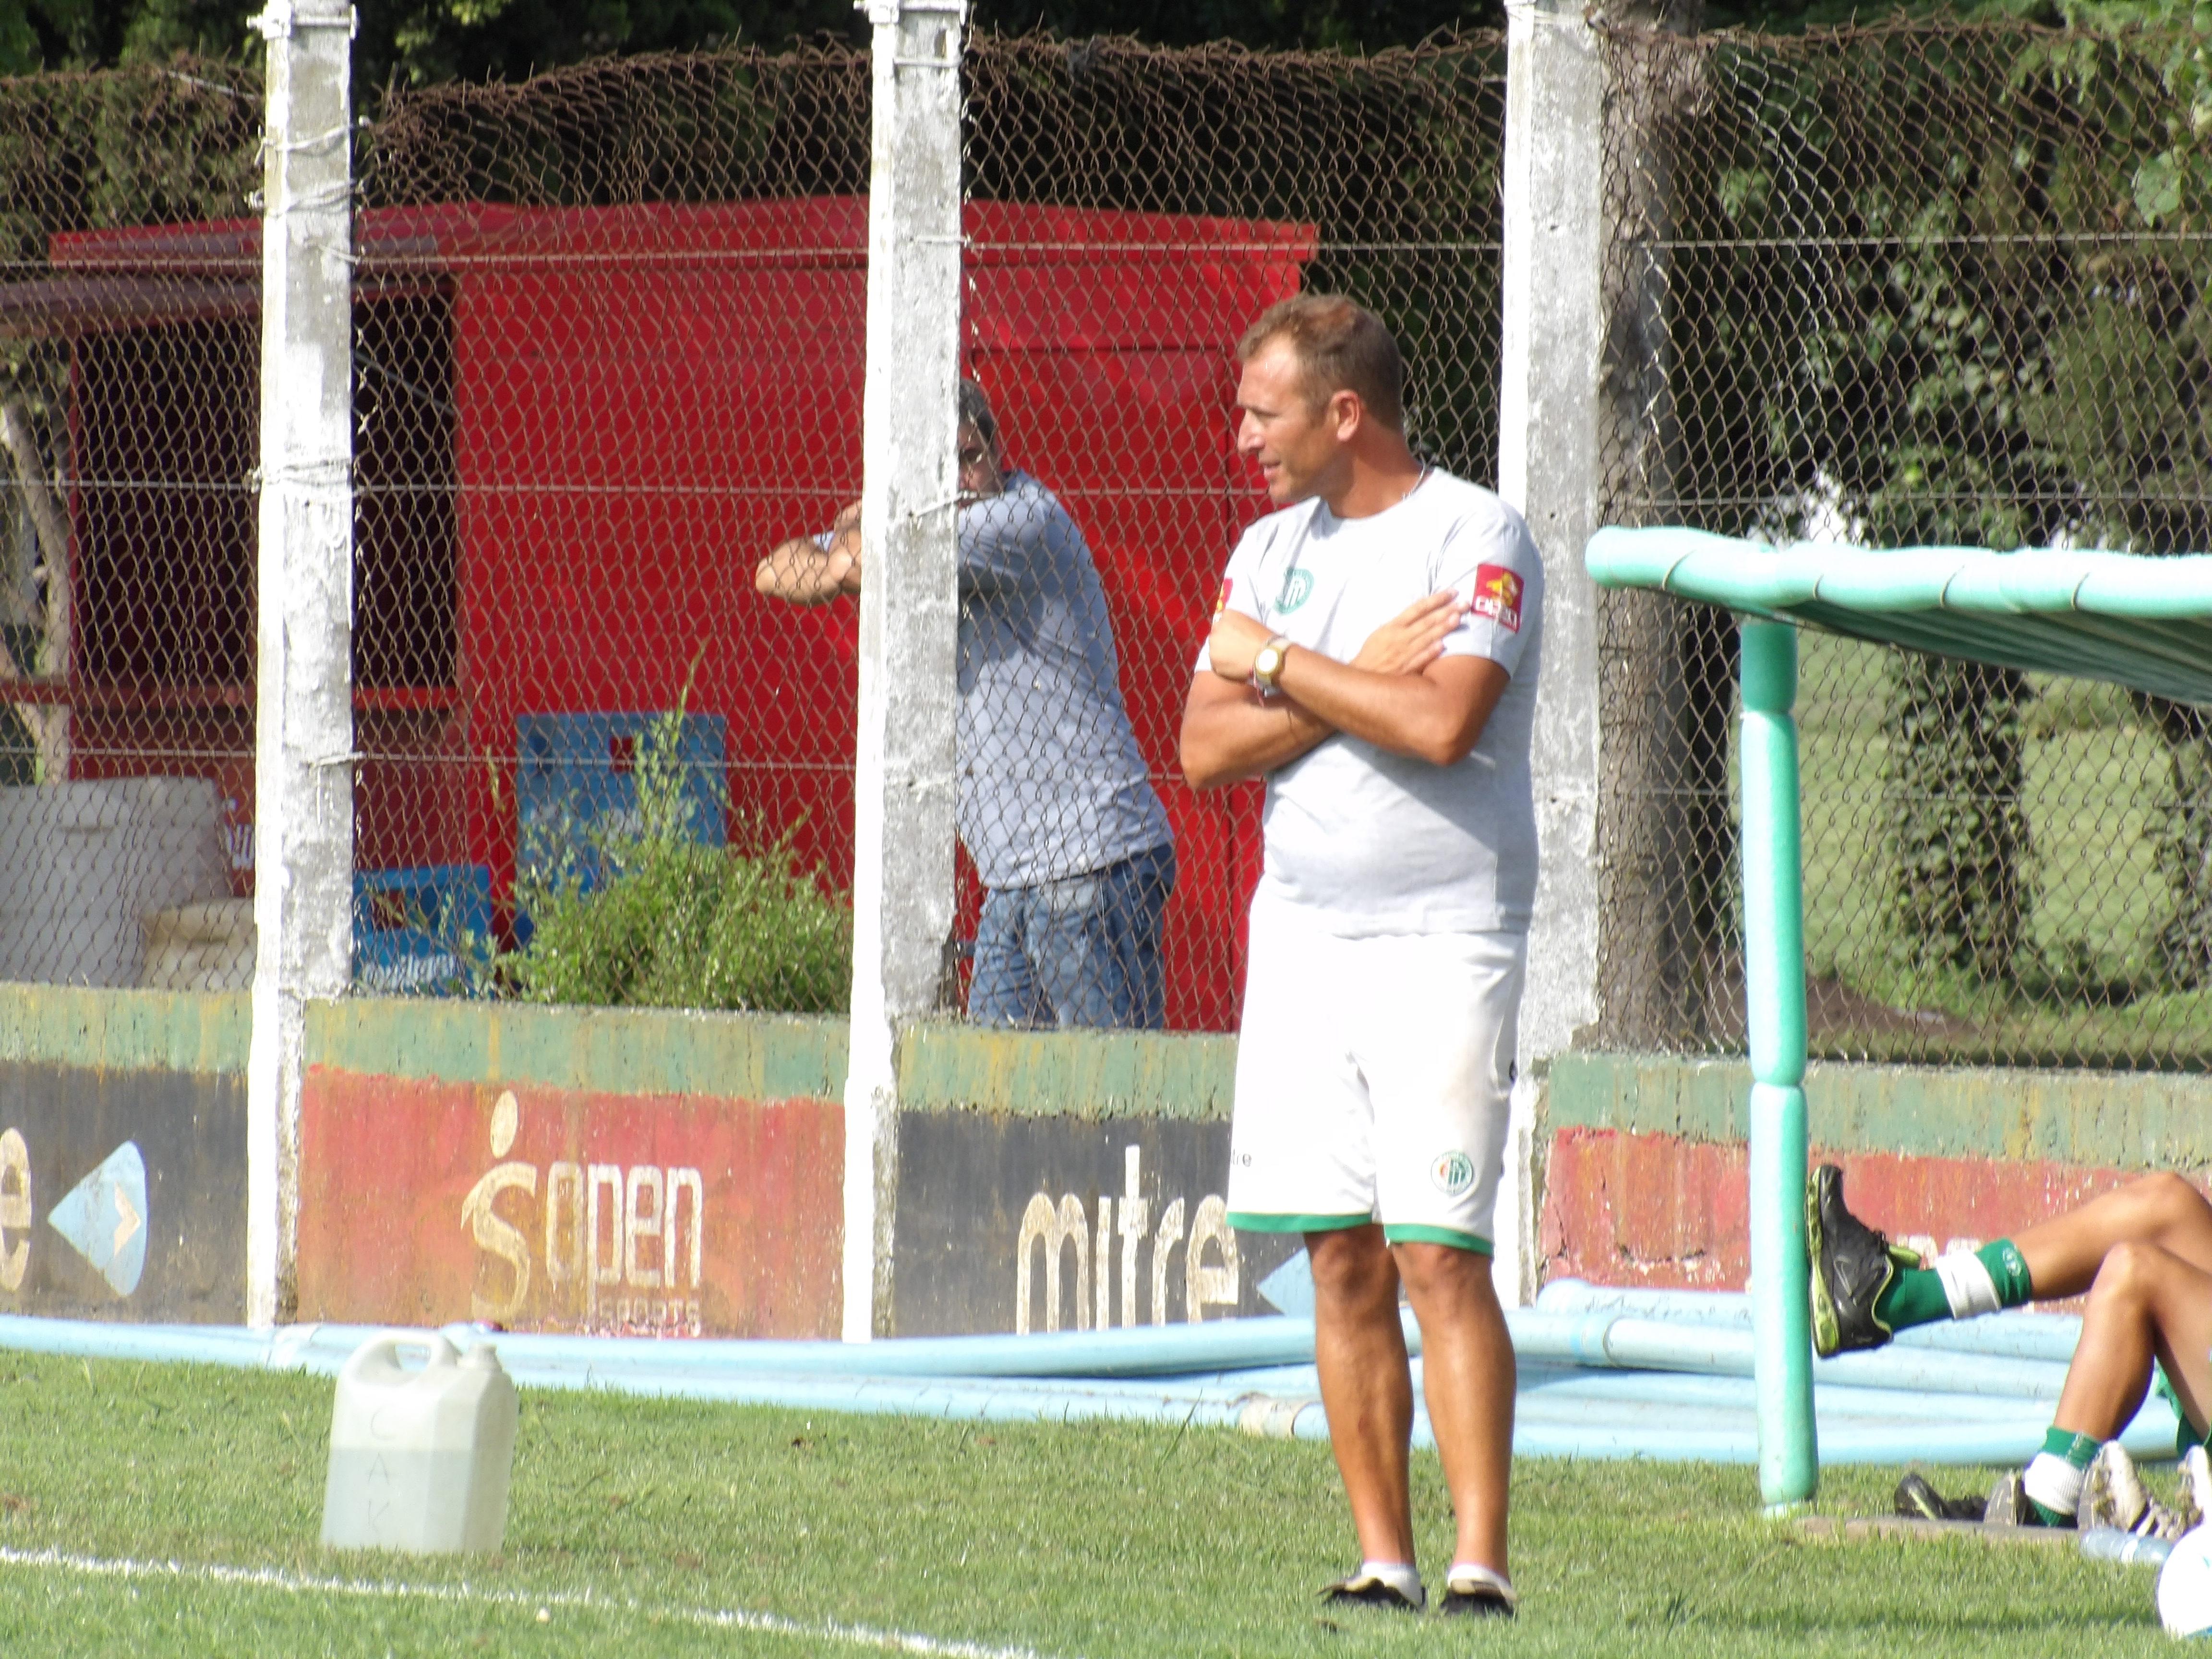 Mariano Mignini supervisando las tareas.